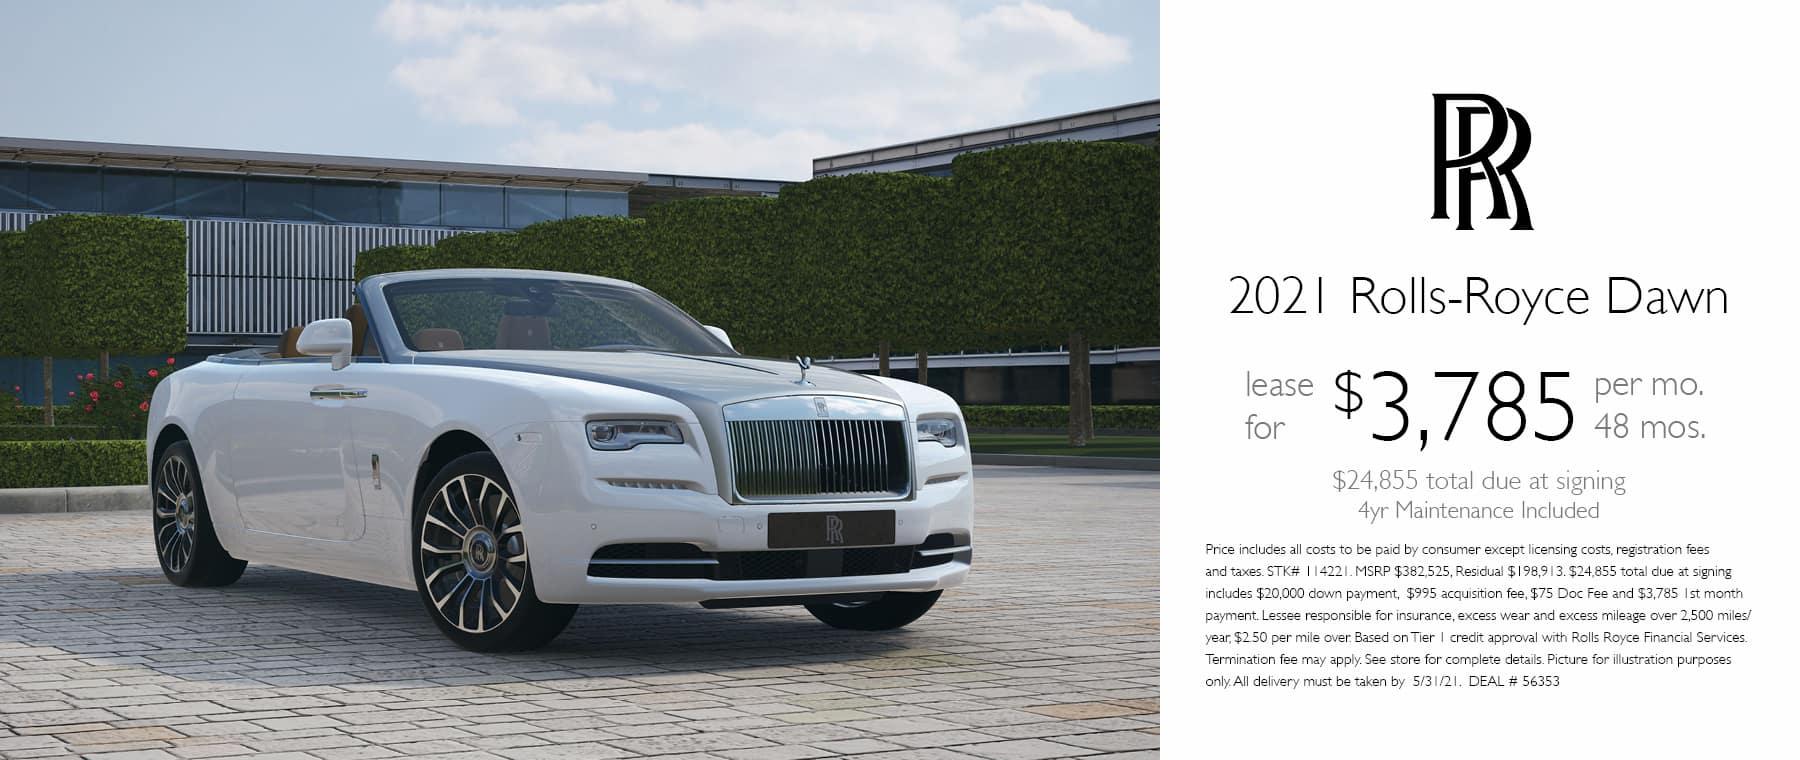 MMC-Exotics-Rolls-Royce-1800×760 MAY 2021 Dawn